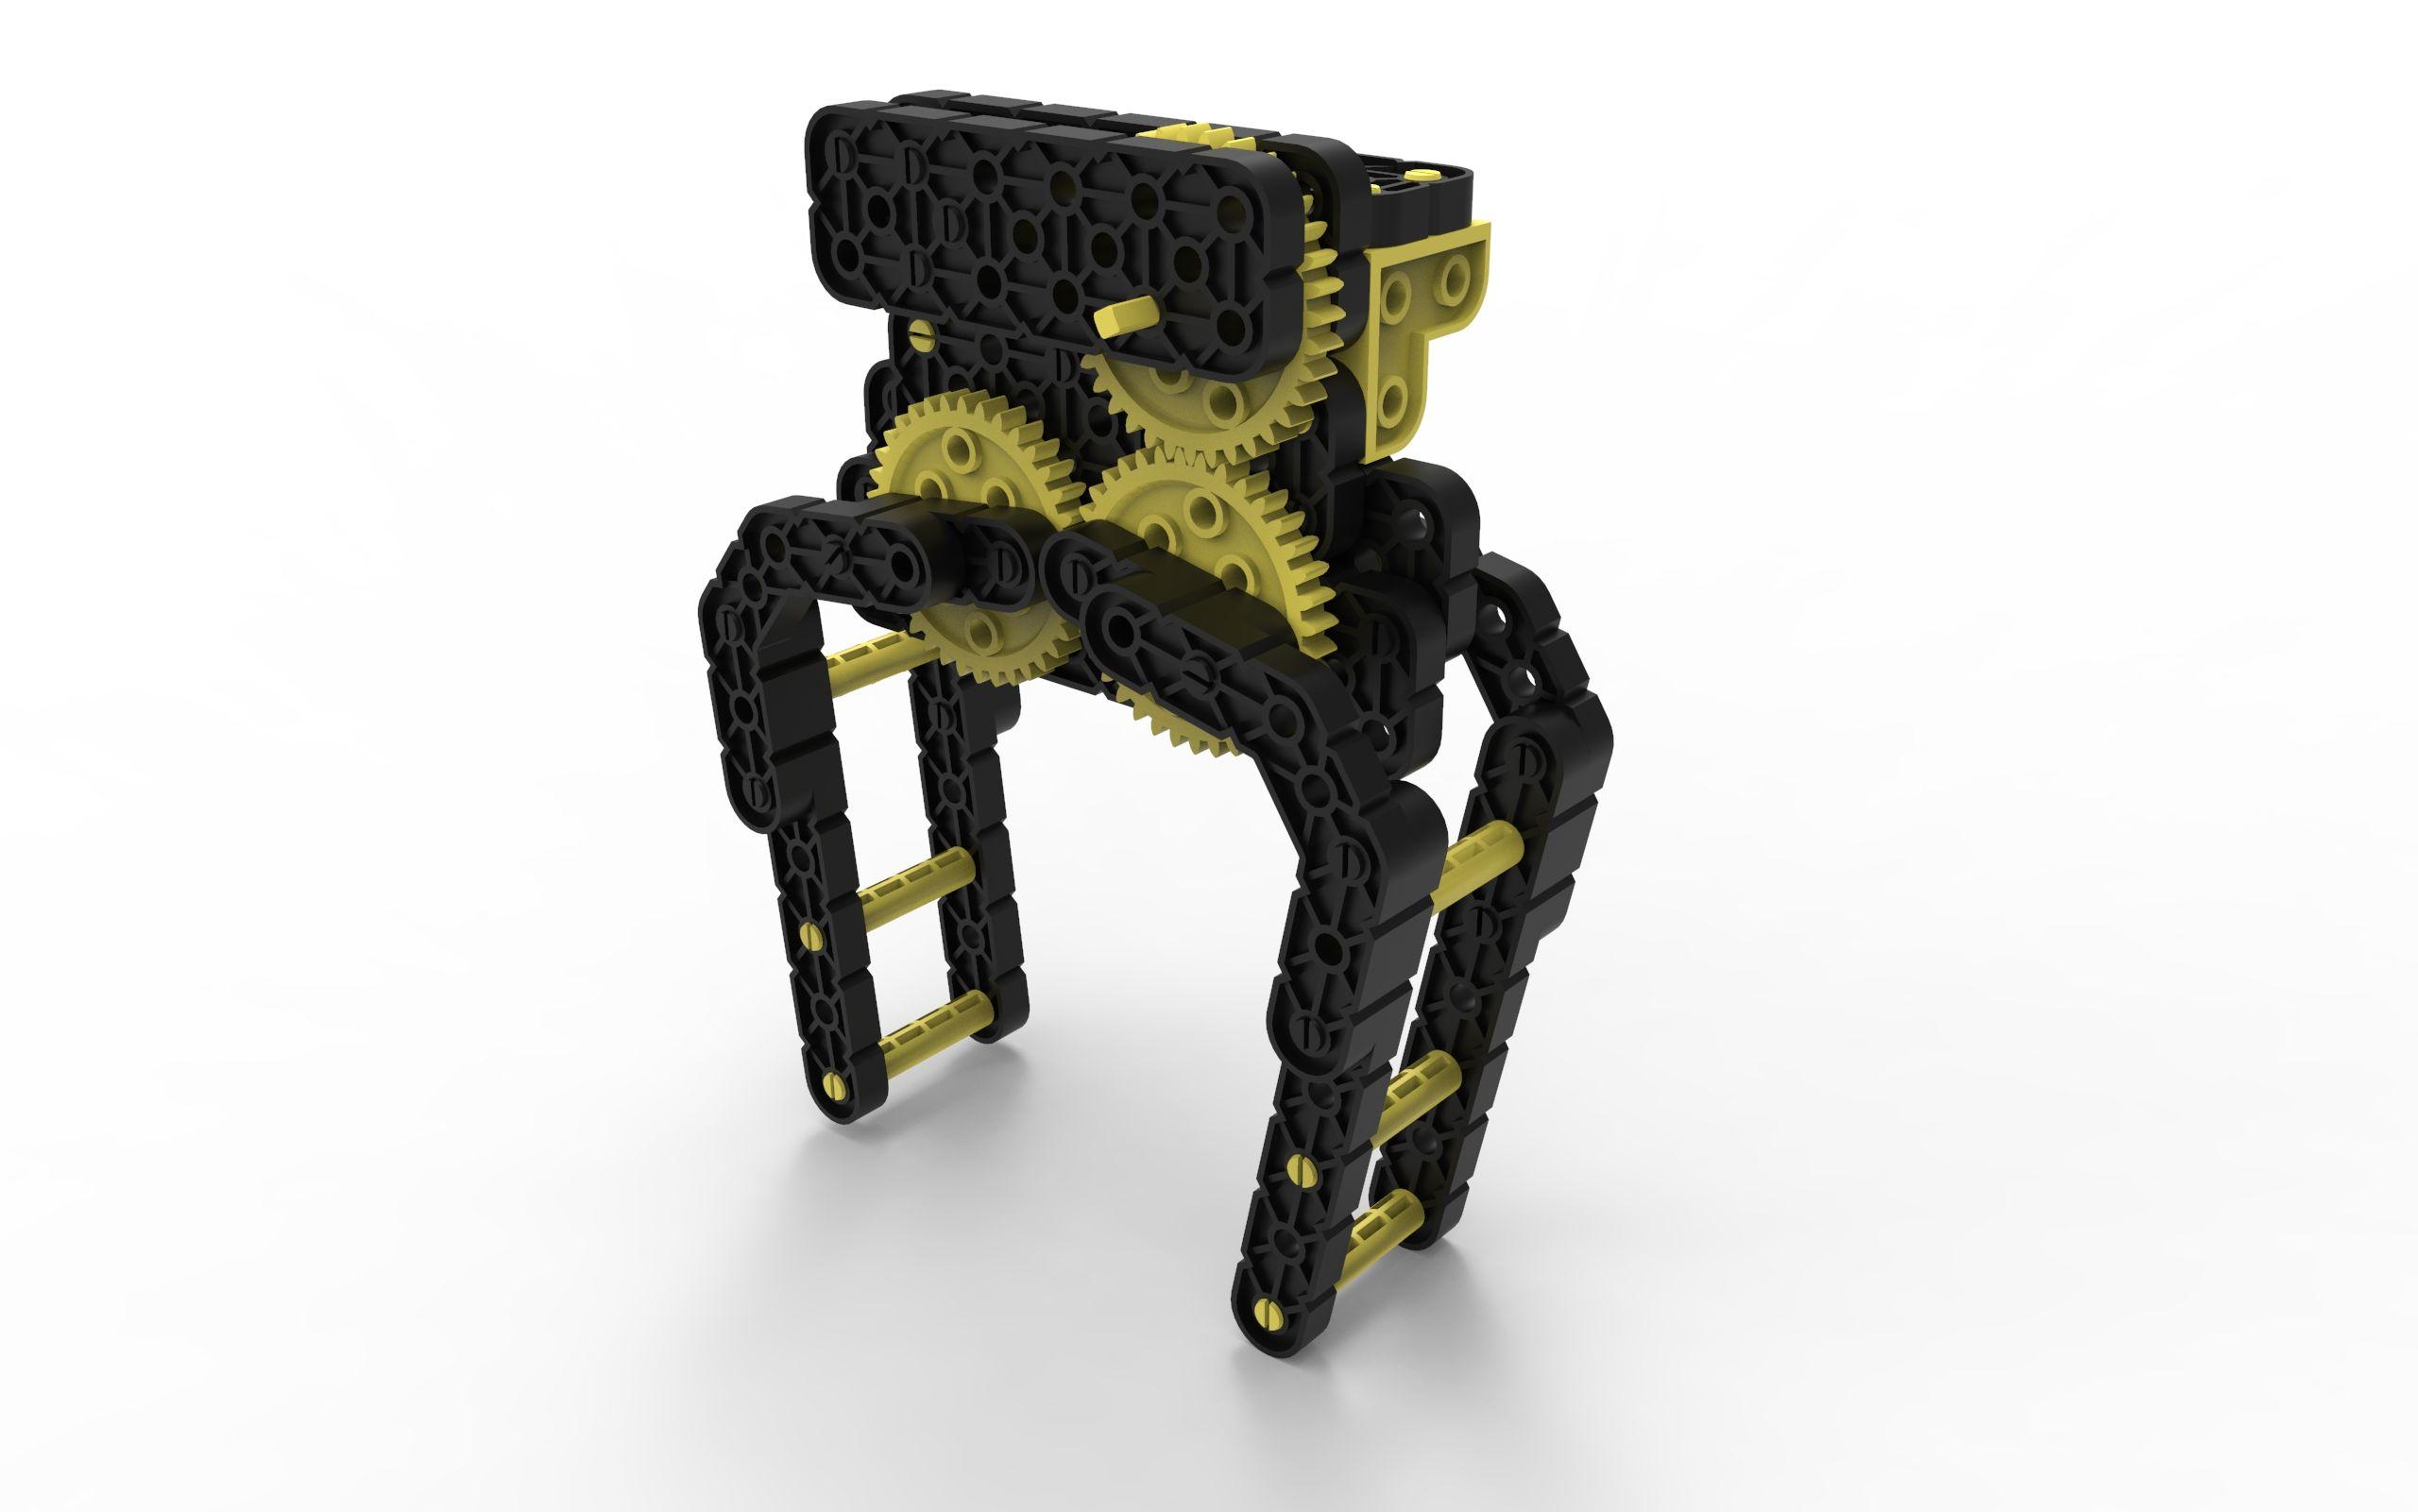 Robot-vexiq-lcs-fabrica-de-nerdes-3500-3500